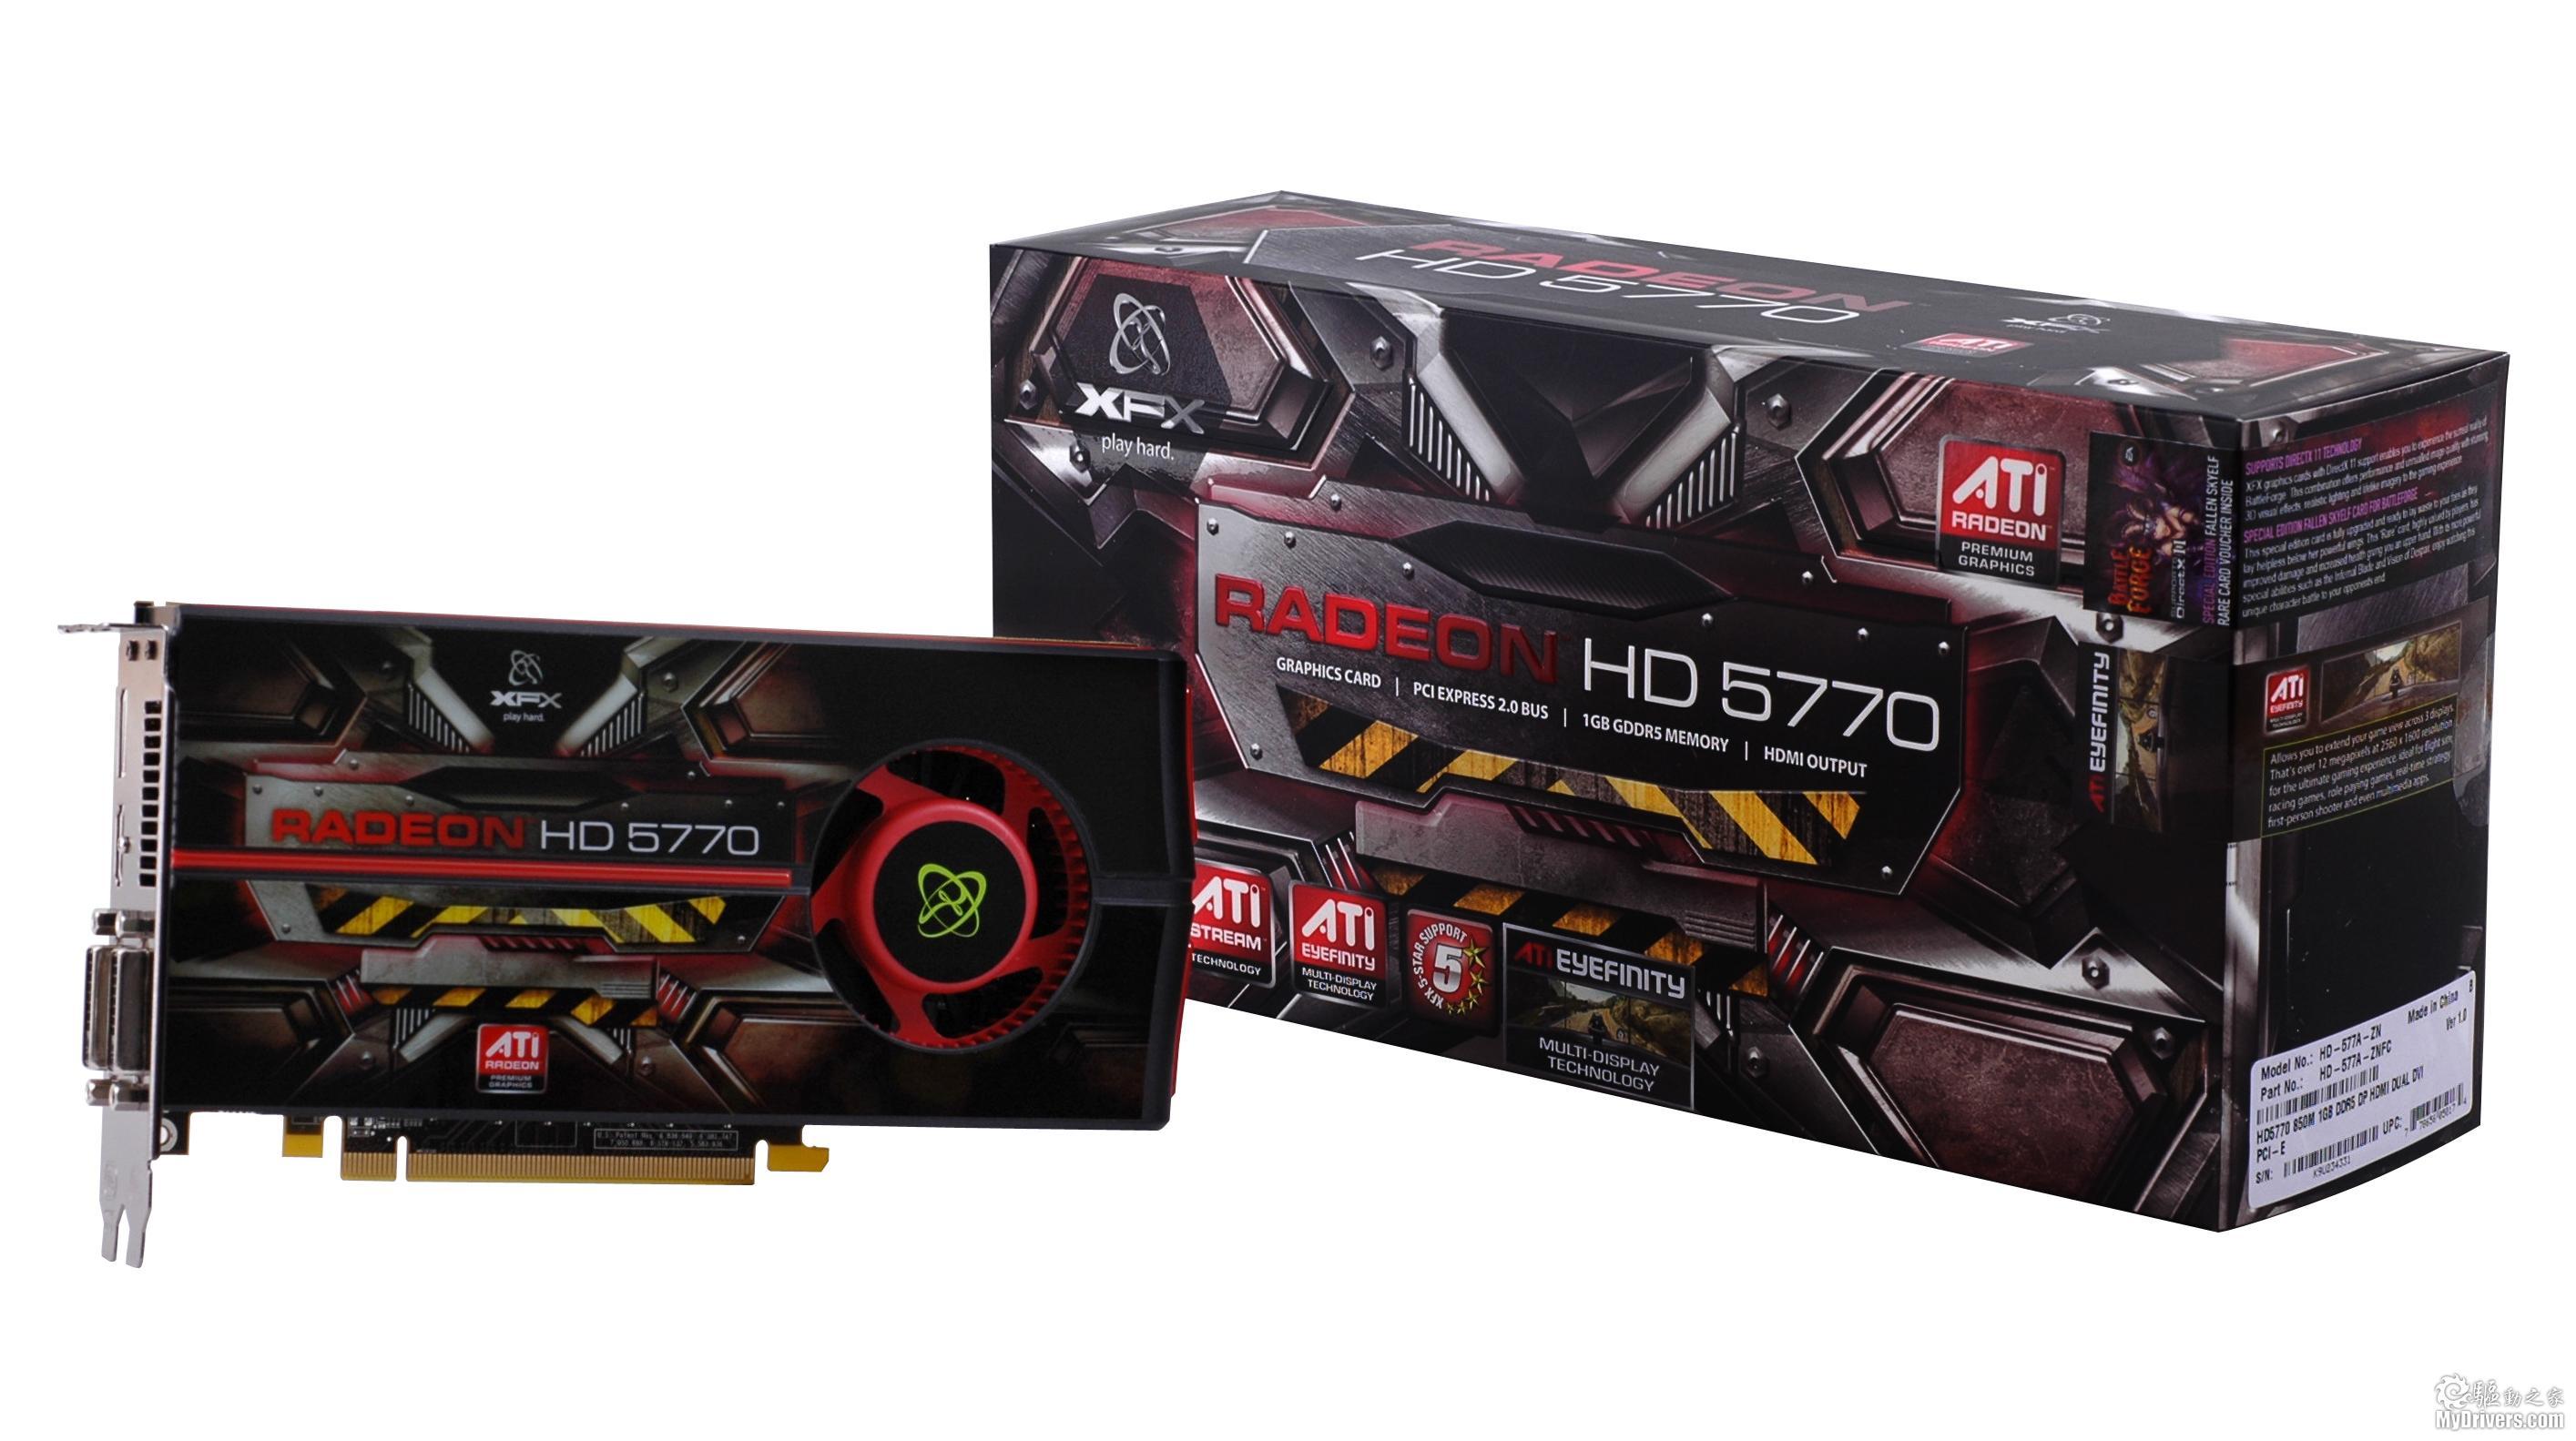 Radeon HD 5770/5750正式发布 DX11走向主流-Radeon HD 5700,5770,5750